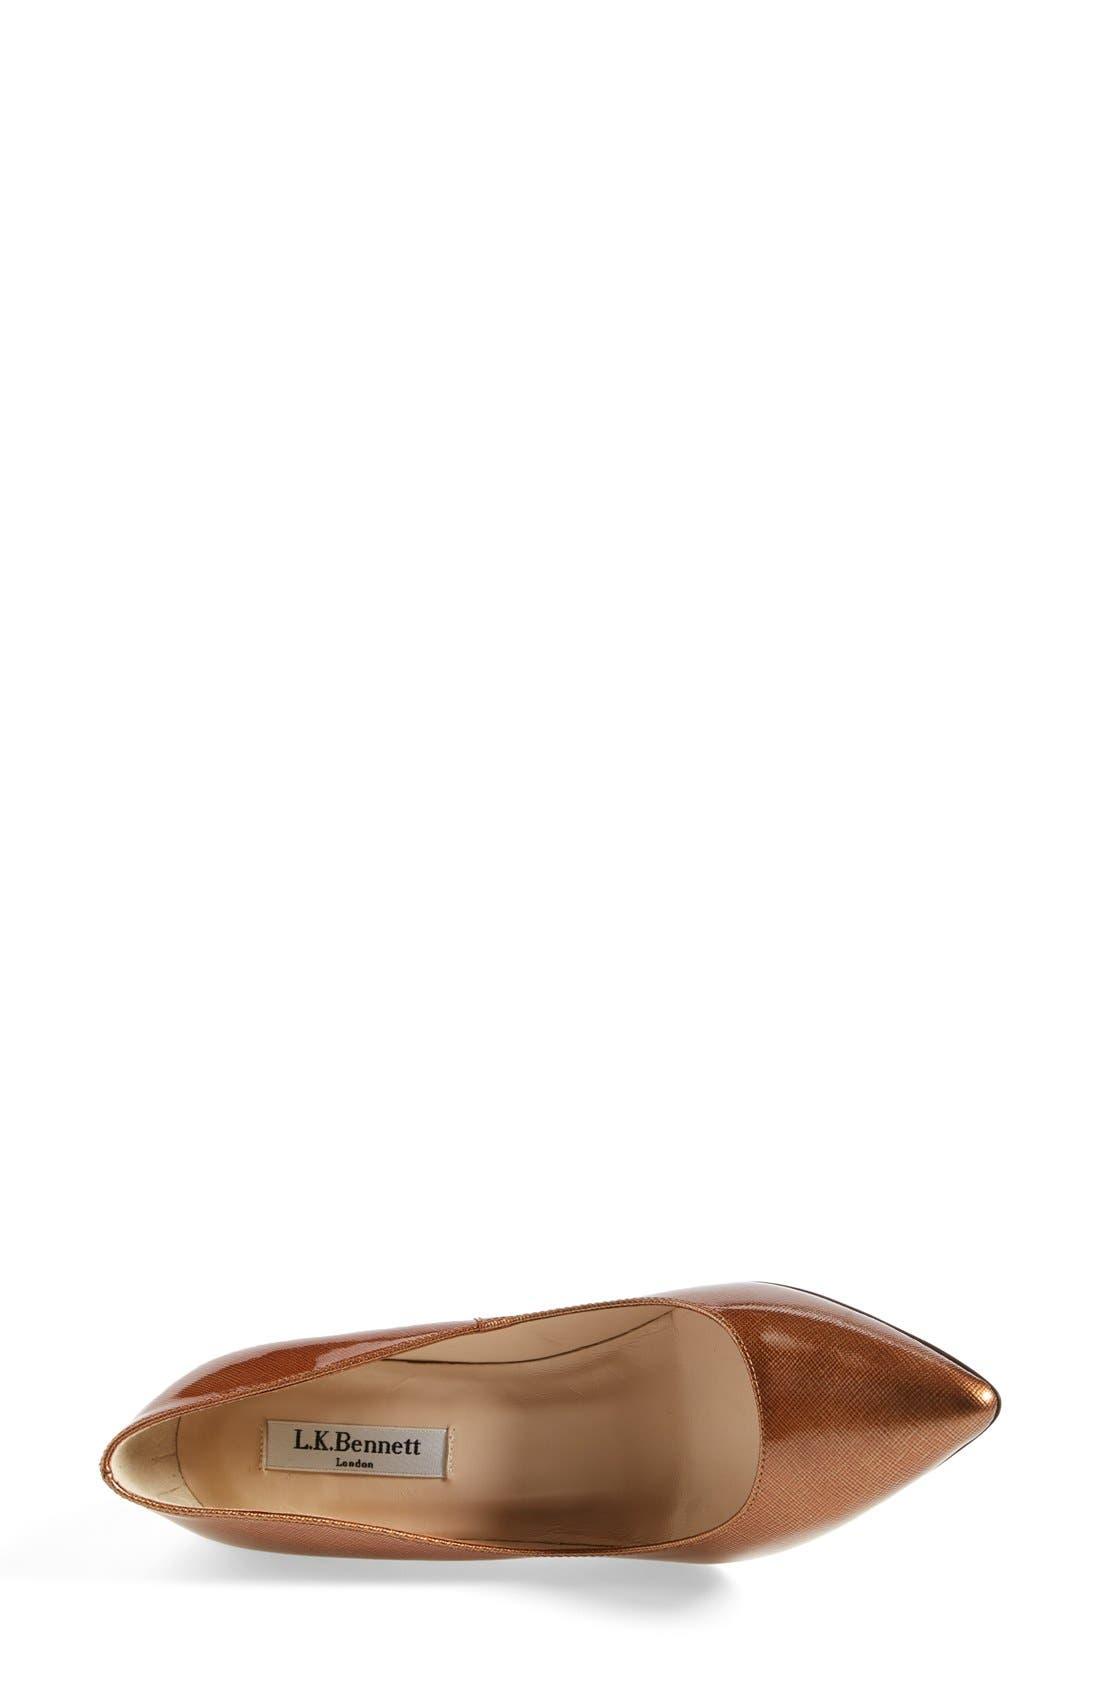 Alternate Image 3  - L.K. Bennett 'Floret' Metallic Saffiano Leather Pointy Toe Pump (Women)